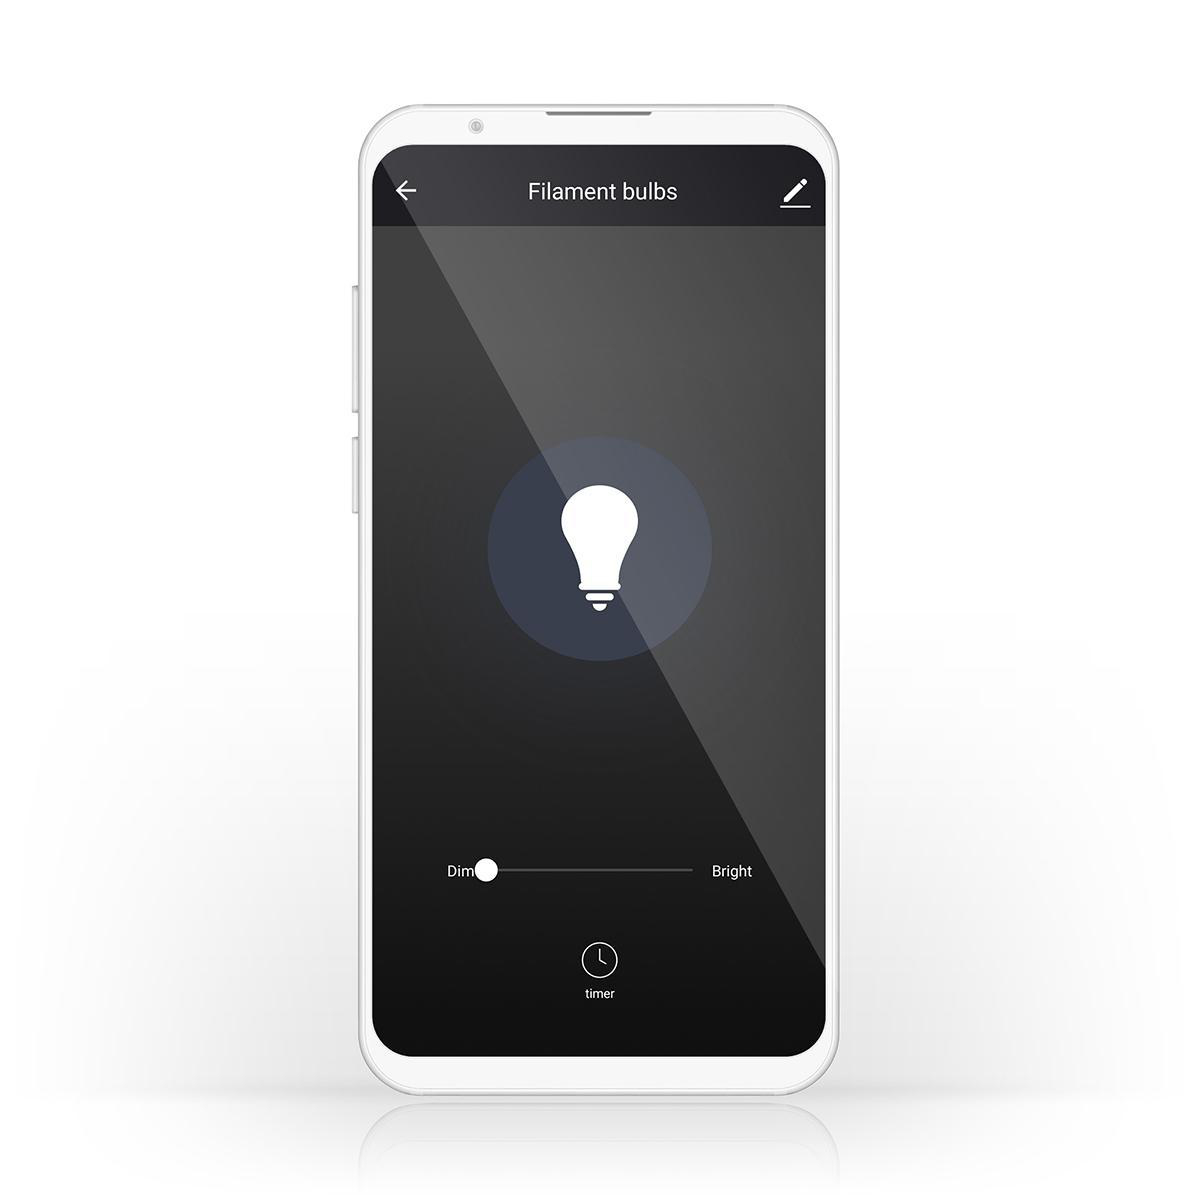 Slimme Wi-Fi Led Lamp helder glas 5 Watt 2700K warm wit - besturing telefoon